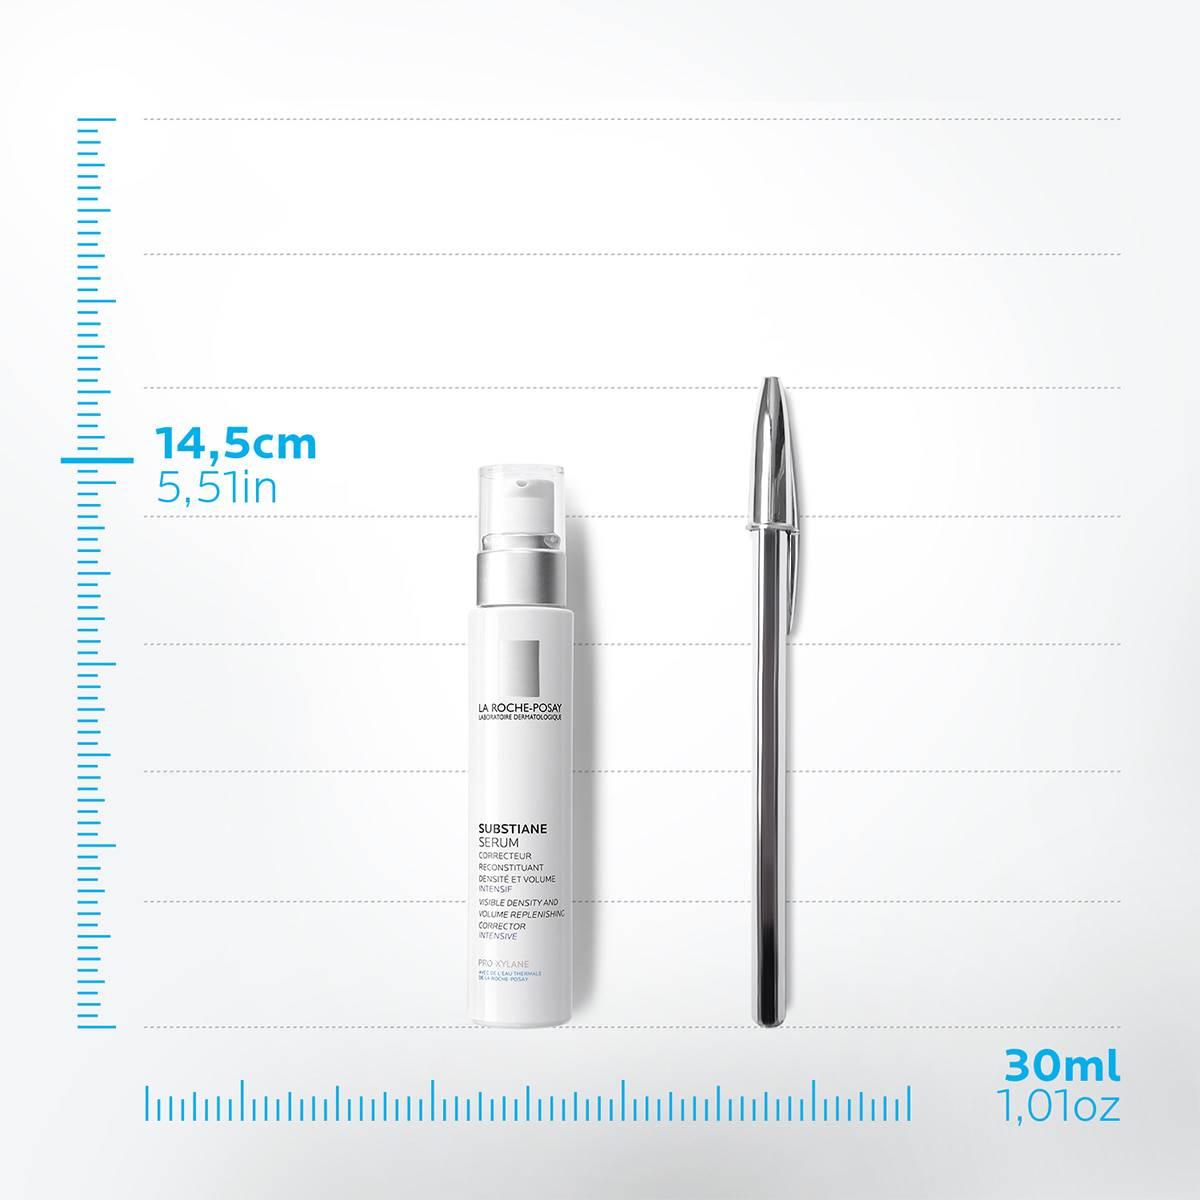 Substiane Serum 30ml Replenishing Density Concentrate